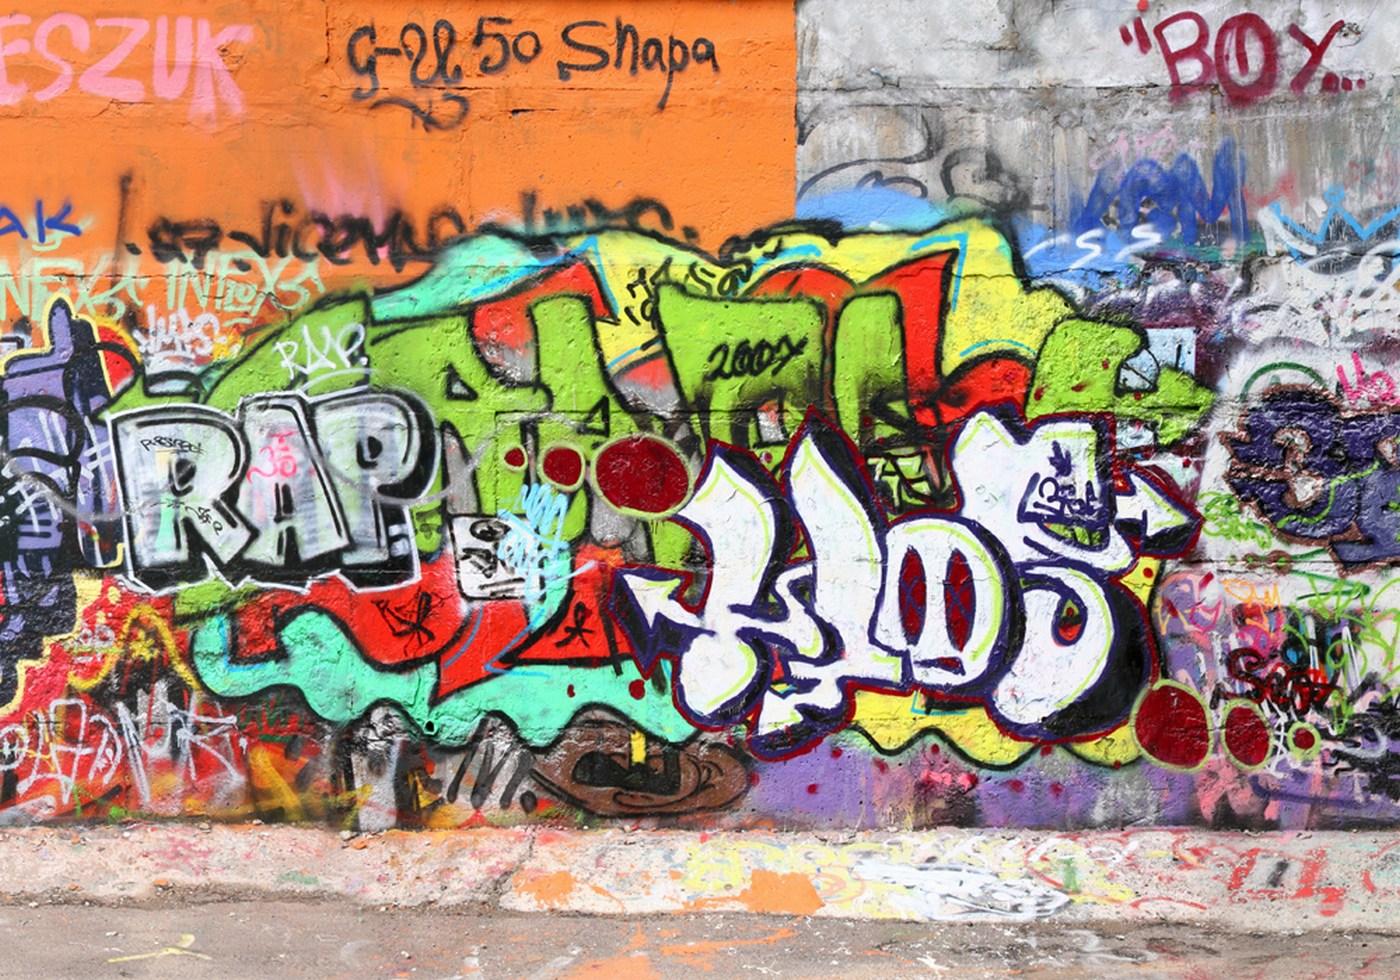 Vlies Fototapete 32 - Graffiti Stone WallKindertapete Tapete Kinderzimmer  Graffiti Streetart Graffiti Sprayer 3D bunt bunt